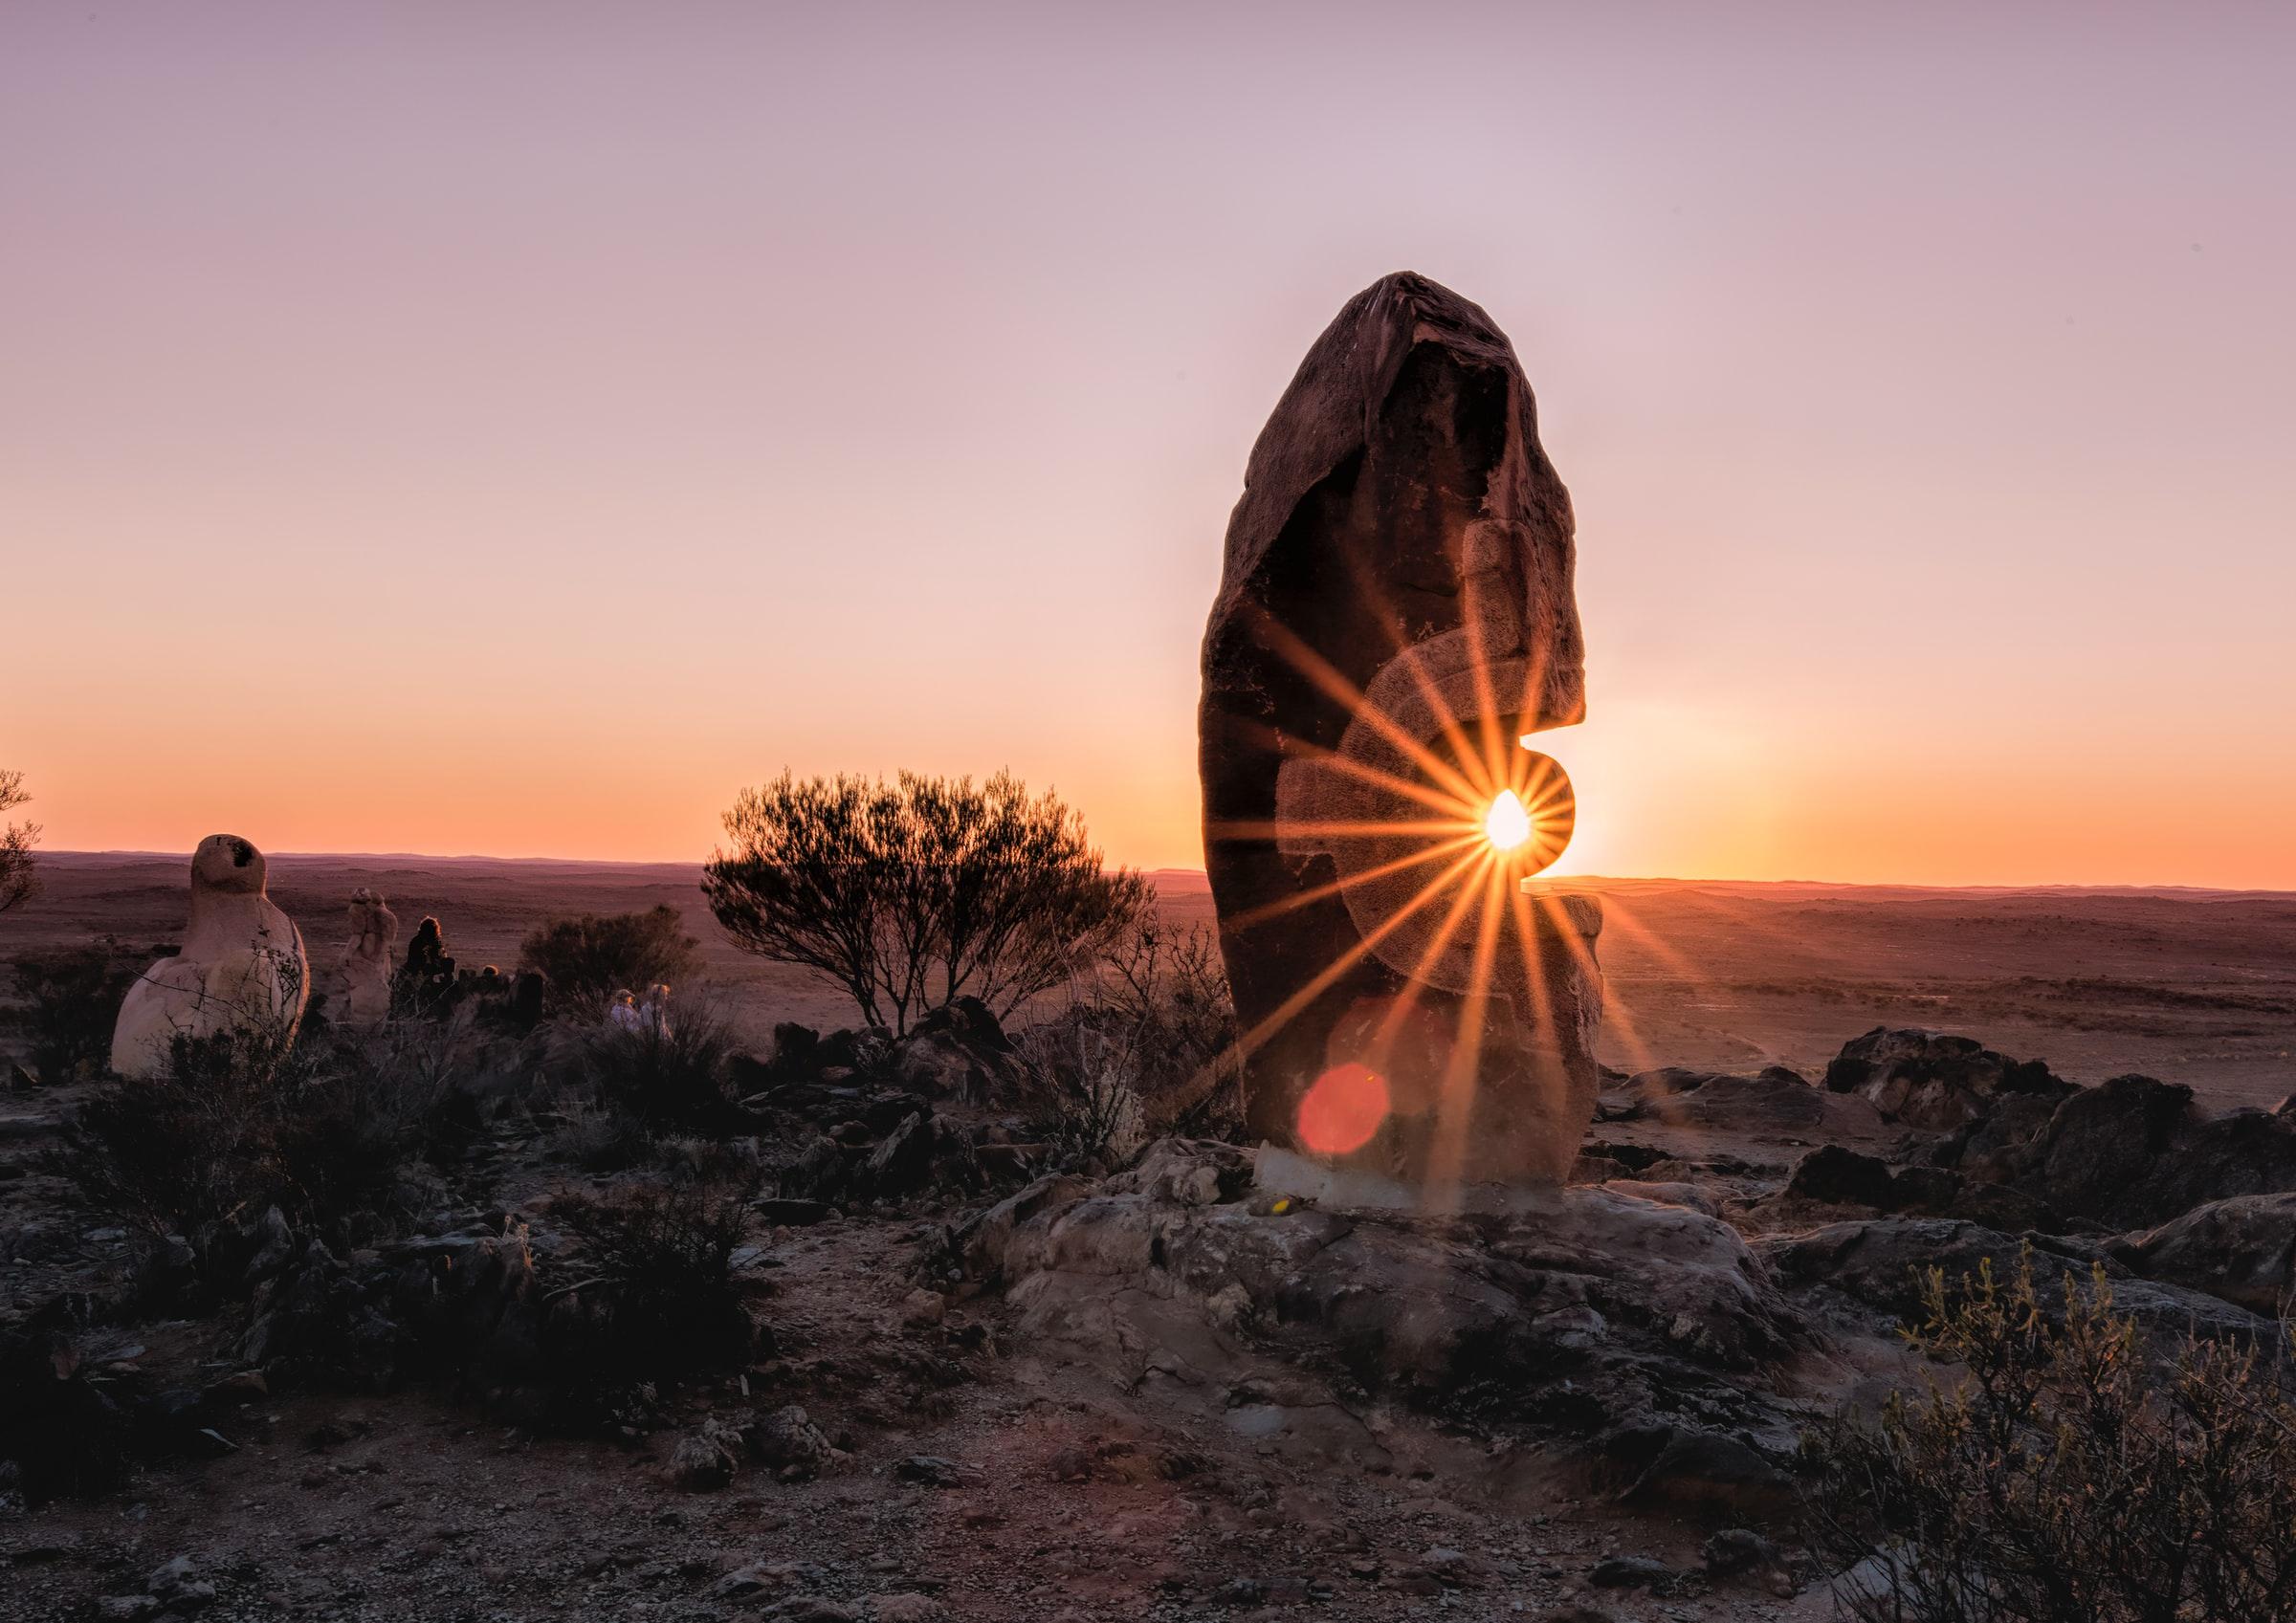 The sun still rises